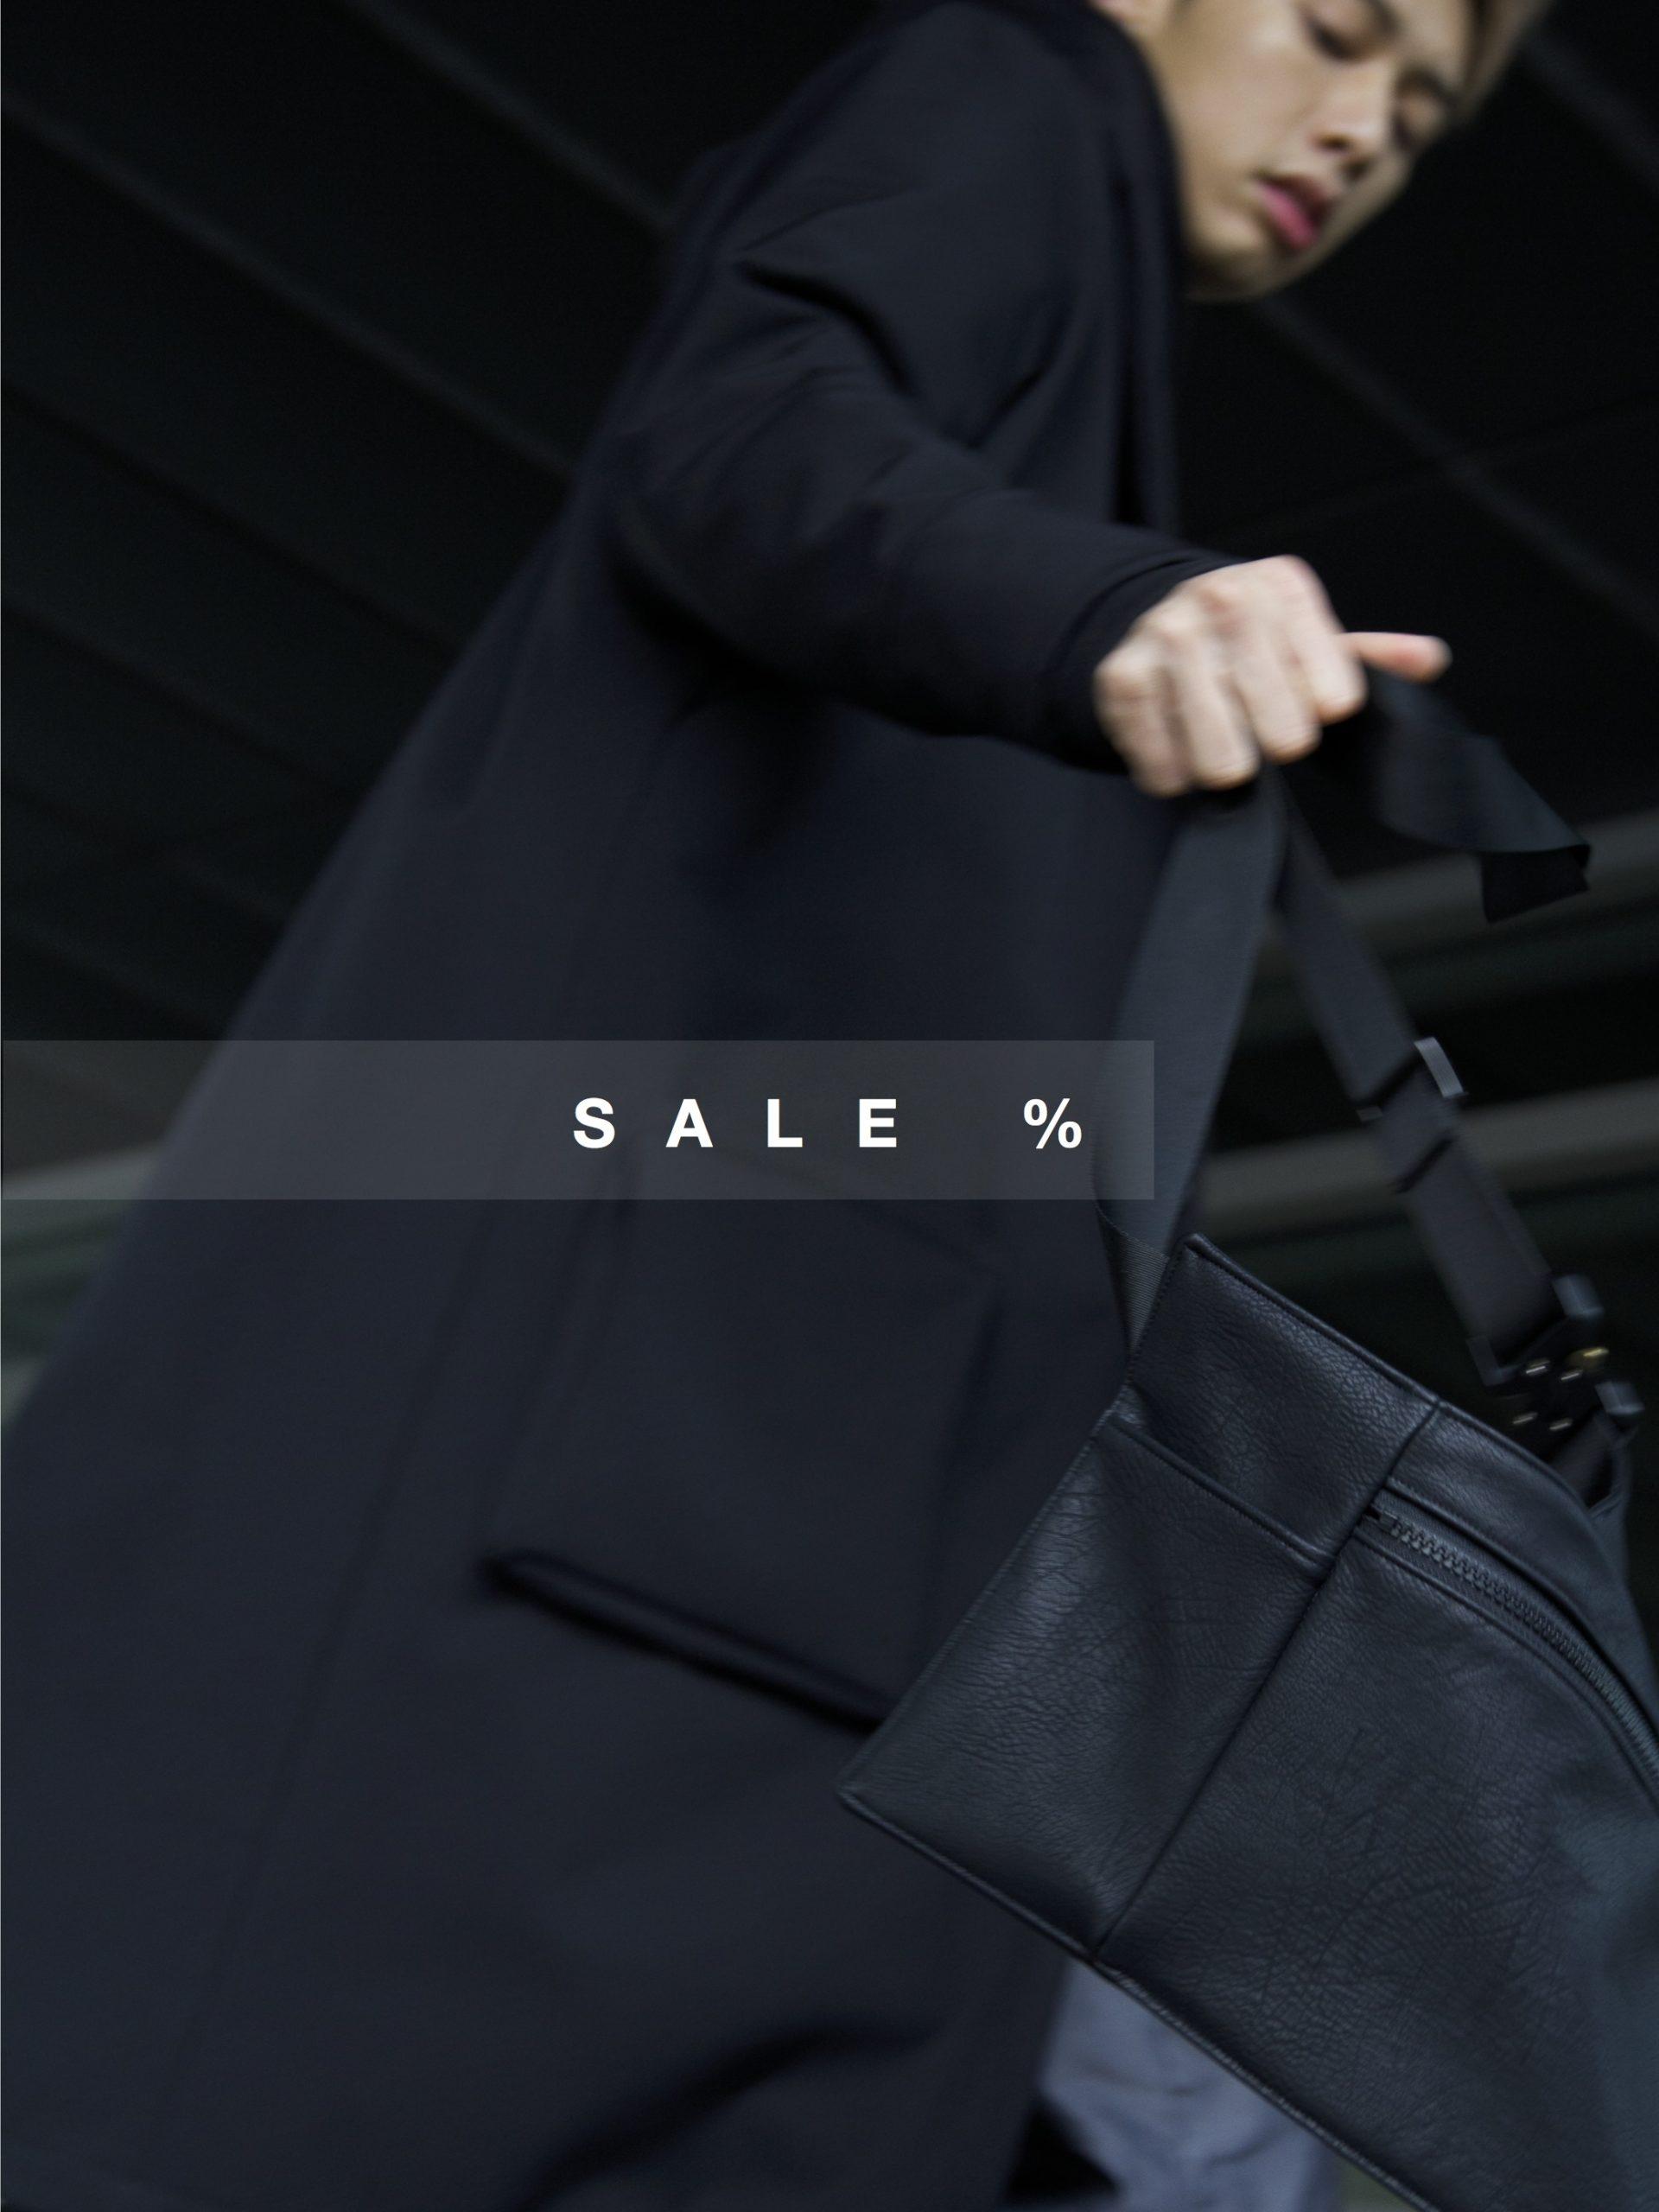 ATHRTY_Amsterdam_sale_image